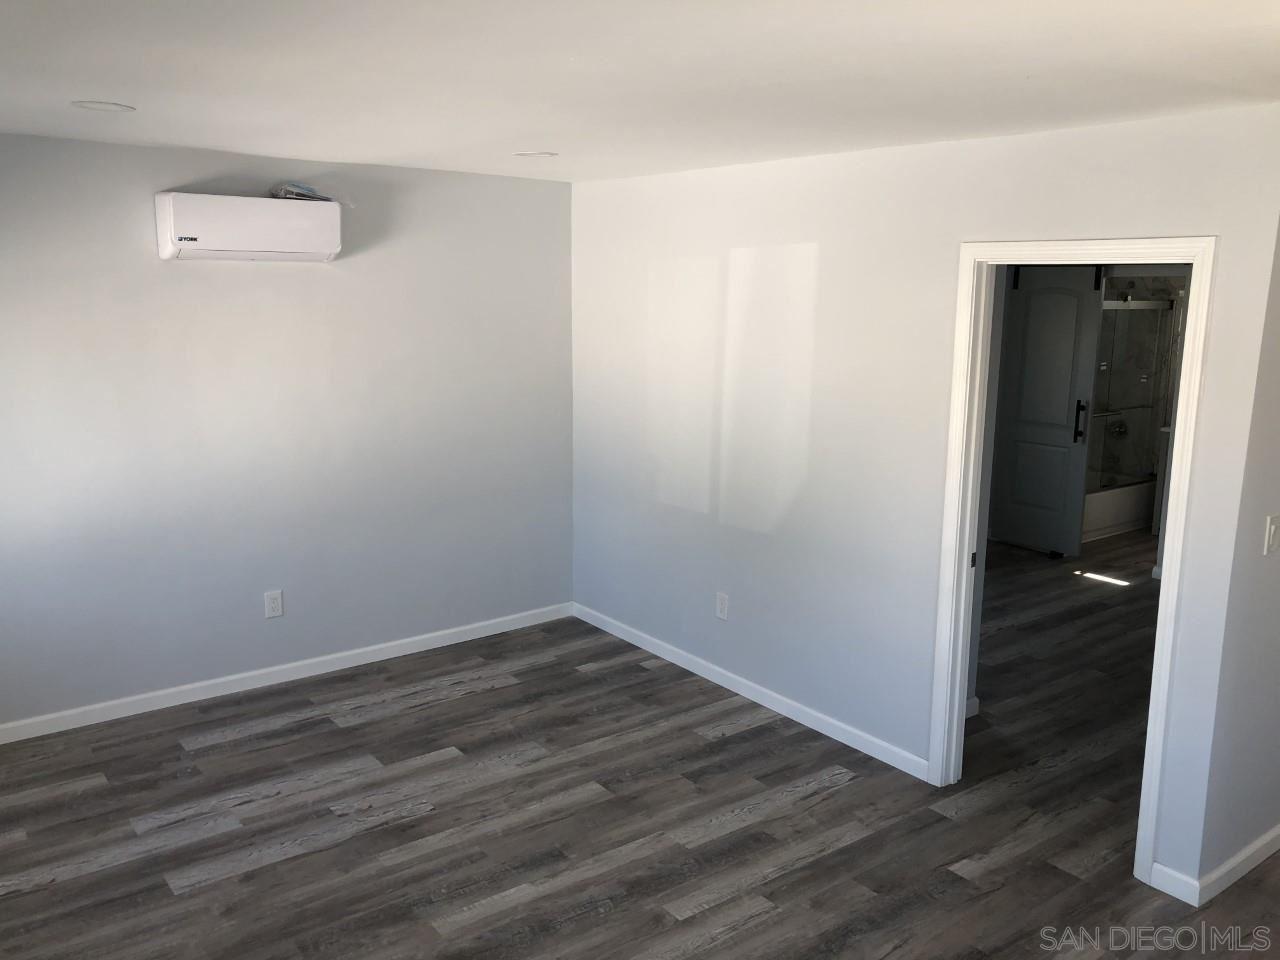 Photo of 3629-31 47Th St, San Diego, CA 92105 (MLS # 210021604)